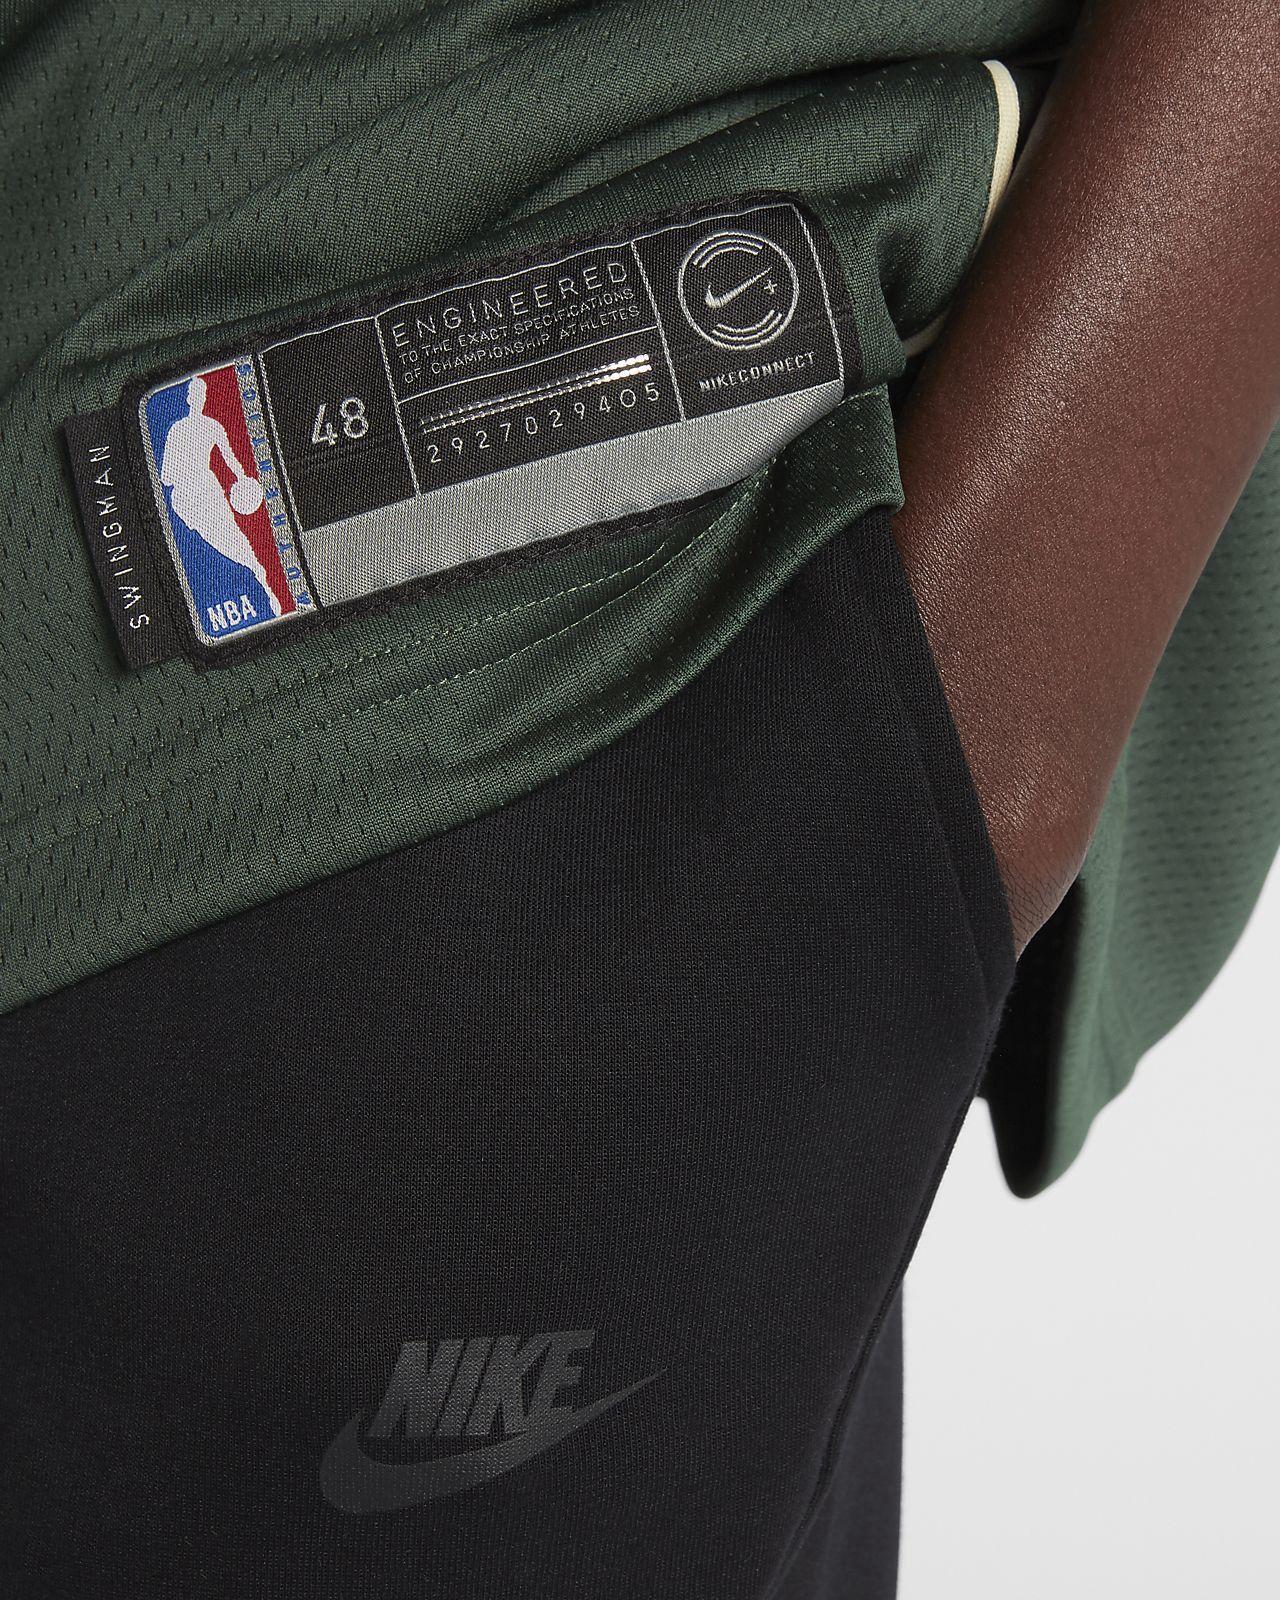 eebbcbea693 Nike Giannis Antetokounmpo Icon Edition Swingman Jersey (Milwaukee Bucks) Men s  Nba Connected - 2Xl (56)